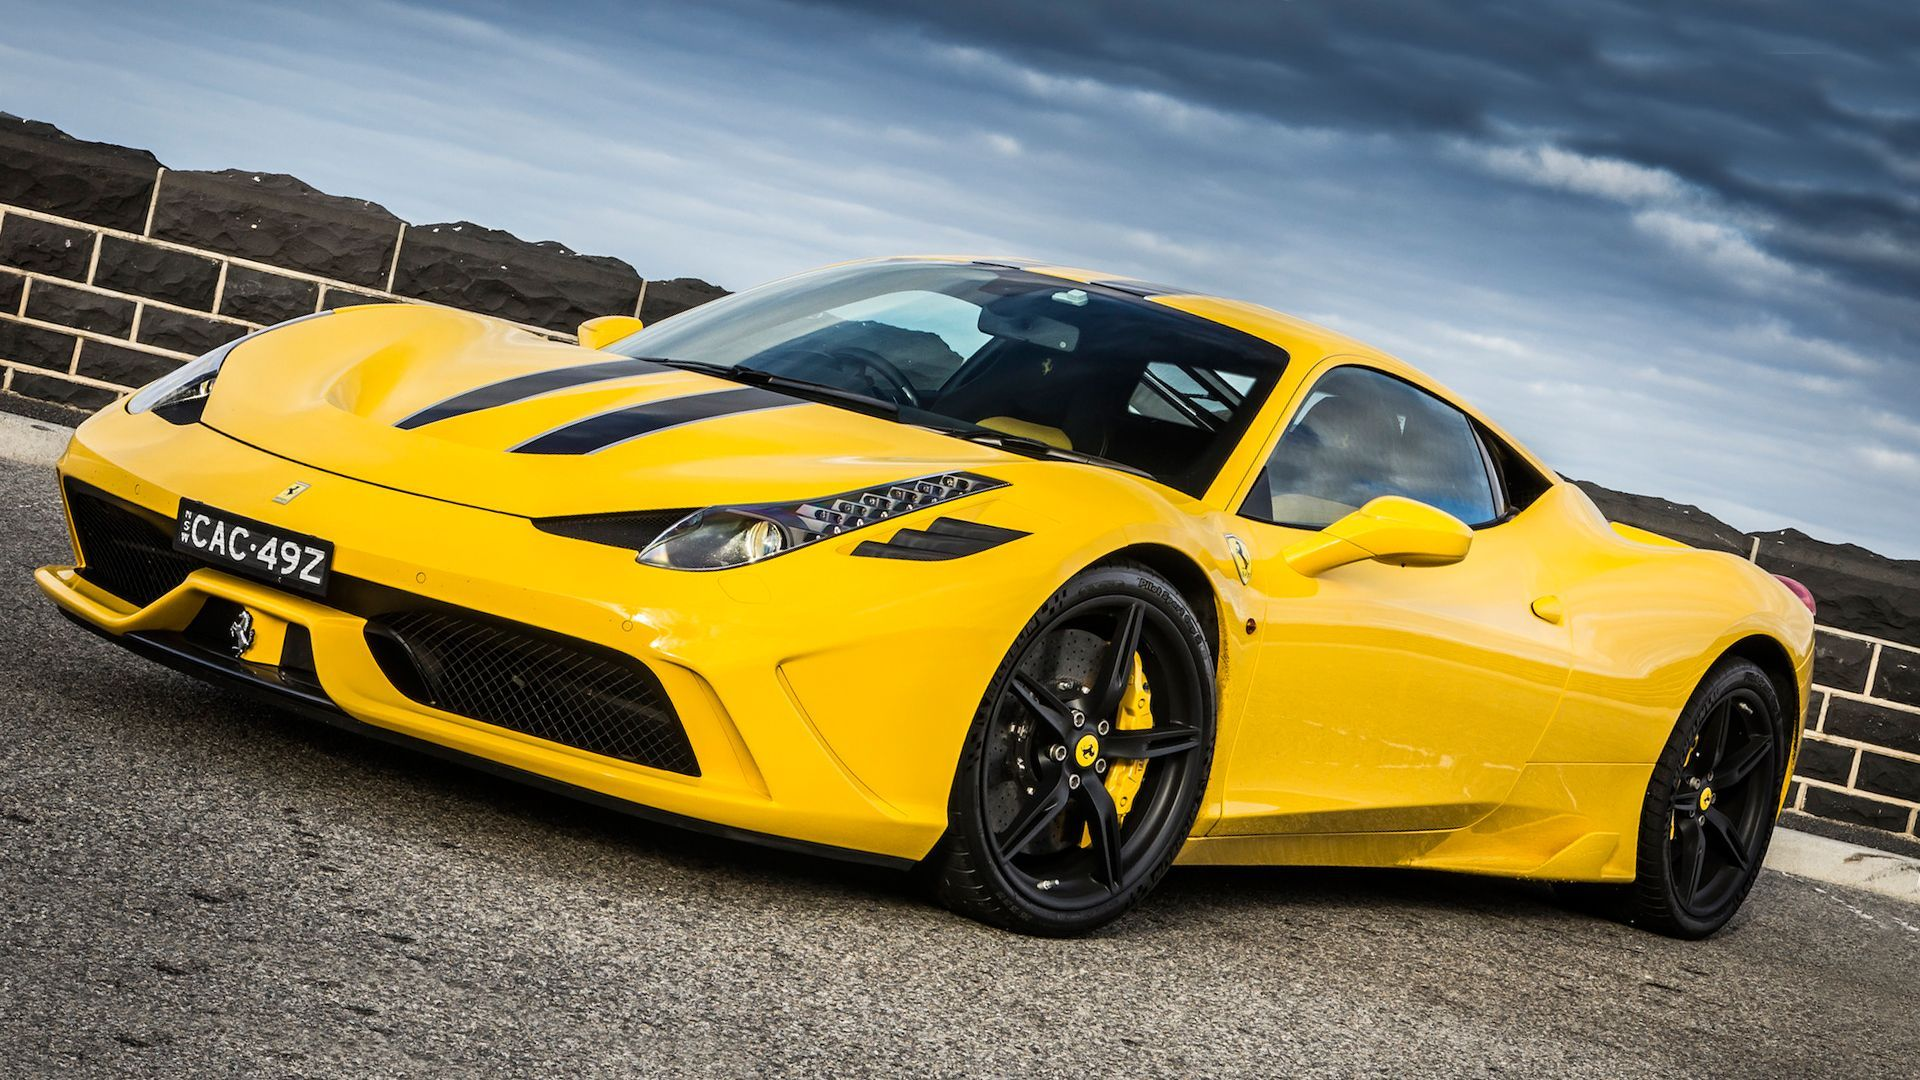 New 2019 Ferrari 458 Speciale Price